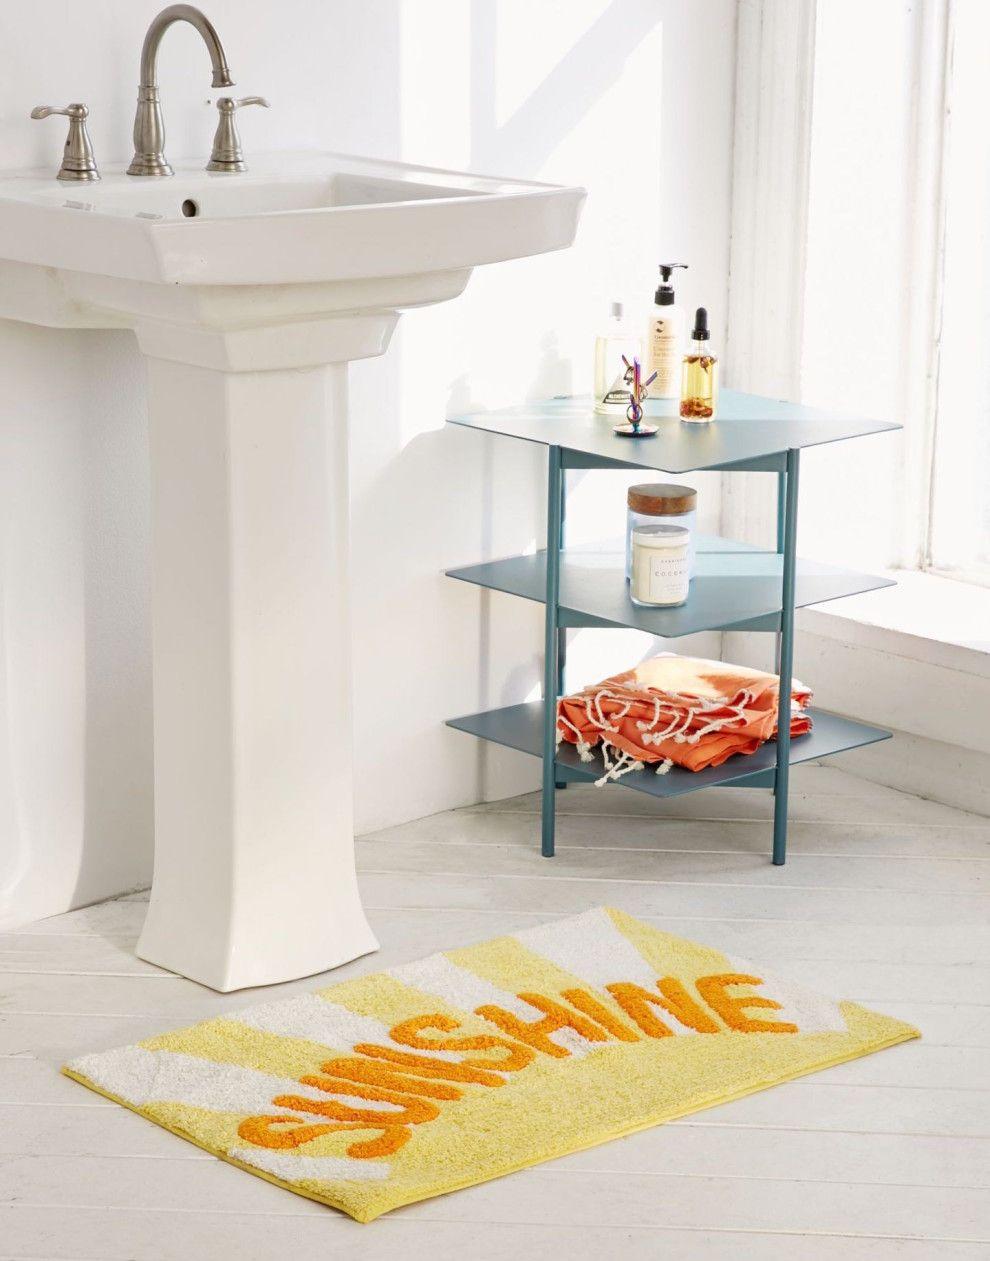 A Sunshine Bath Mat For 17 49 Originally 34 Bathroom Decor Home Luxury Decor [ 1261 x 990 Pixel ]